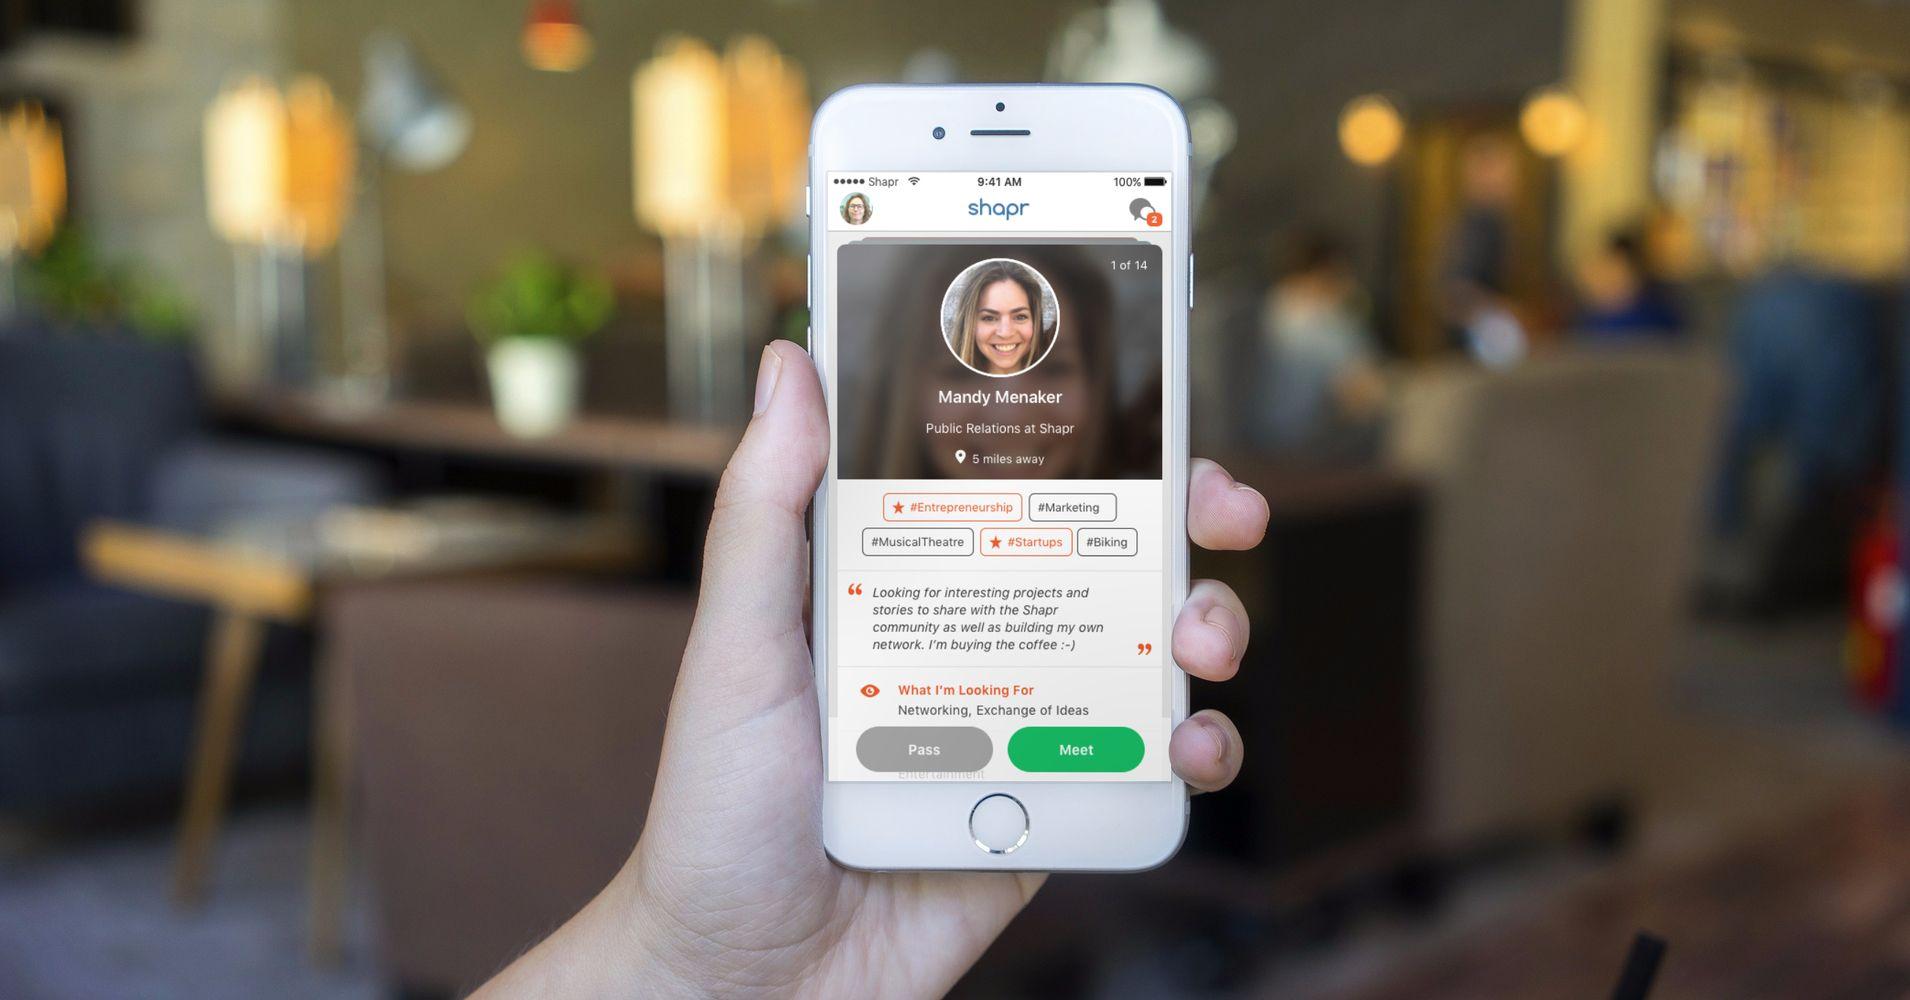 Thumbnail for Professional Networking App Shapr Raises a $9.5 Million Series A